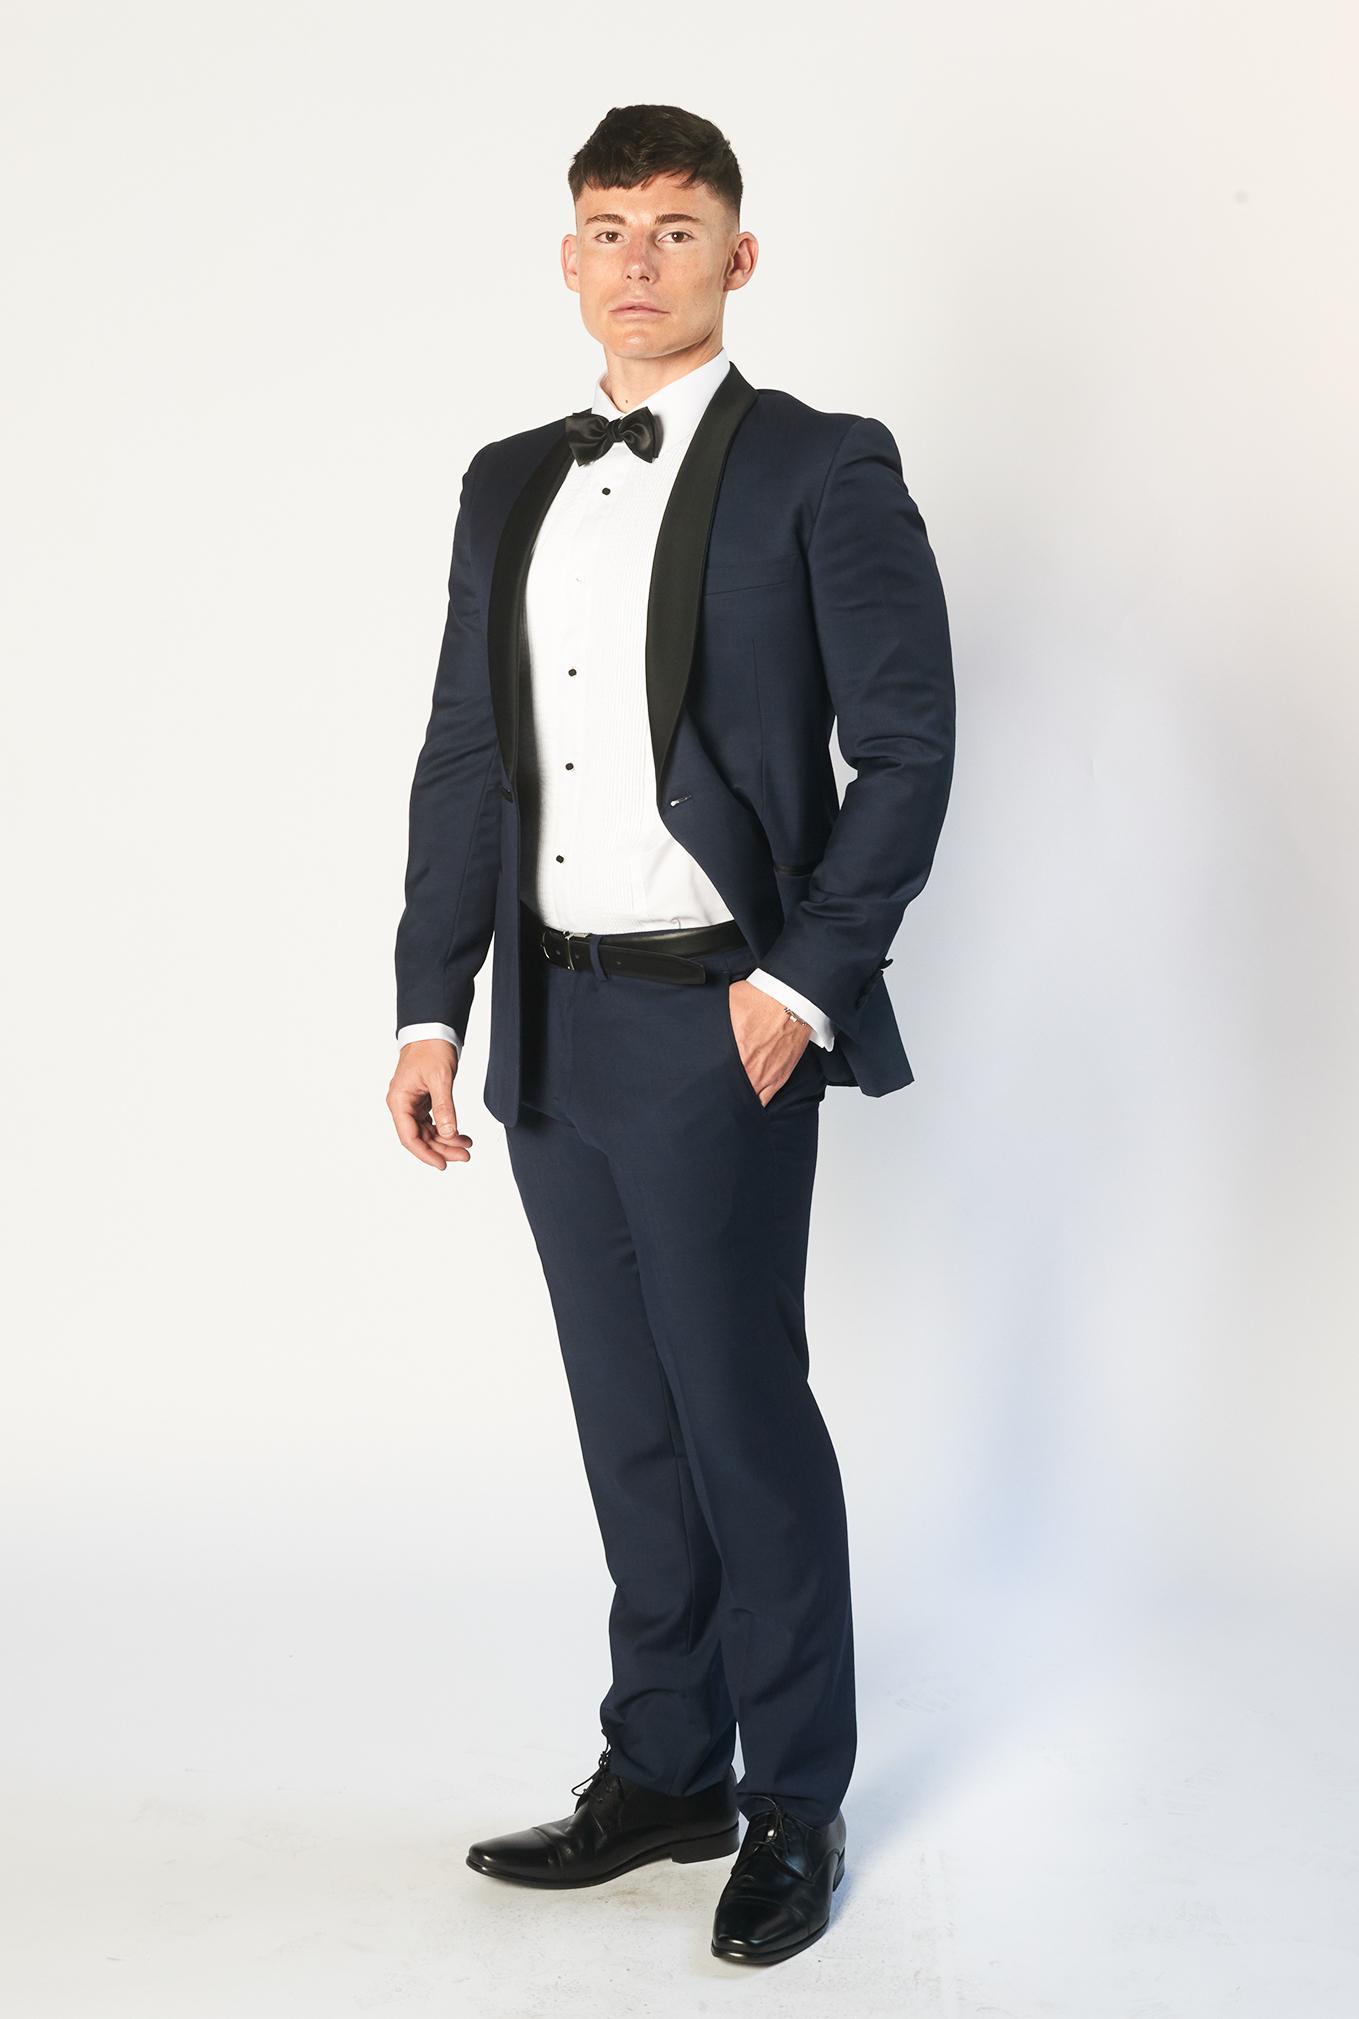 The Bond tuxedo side view